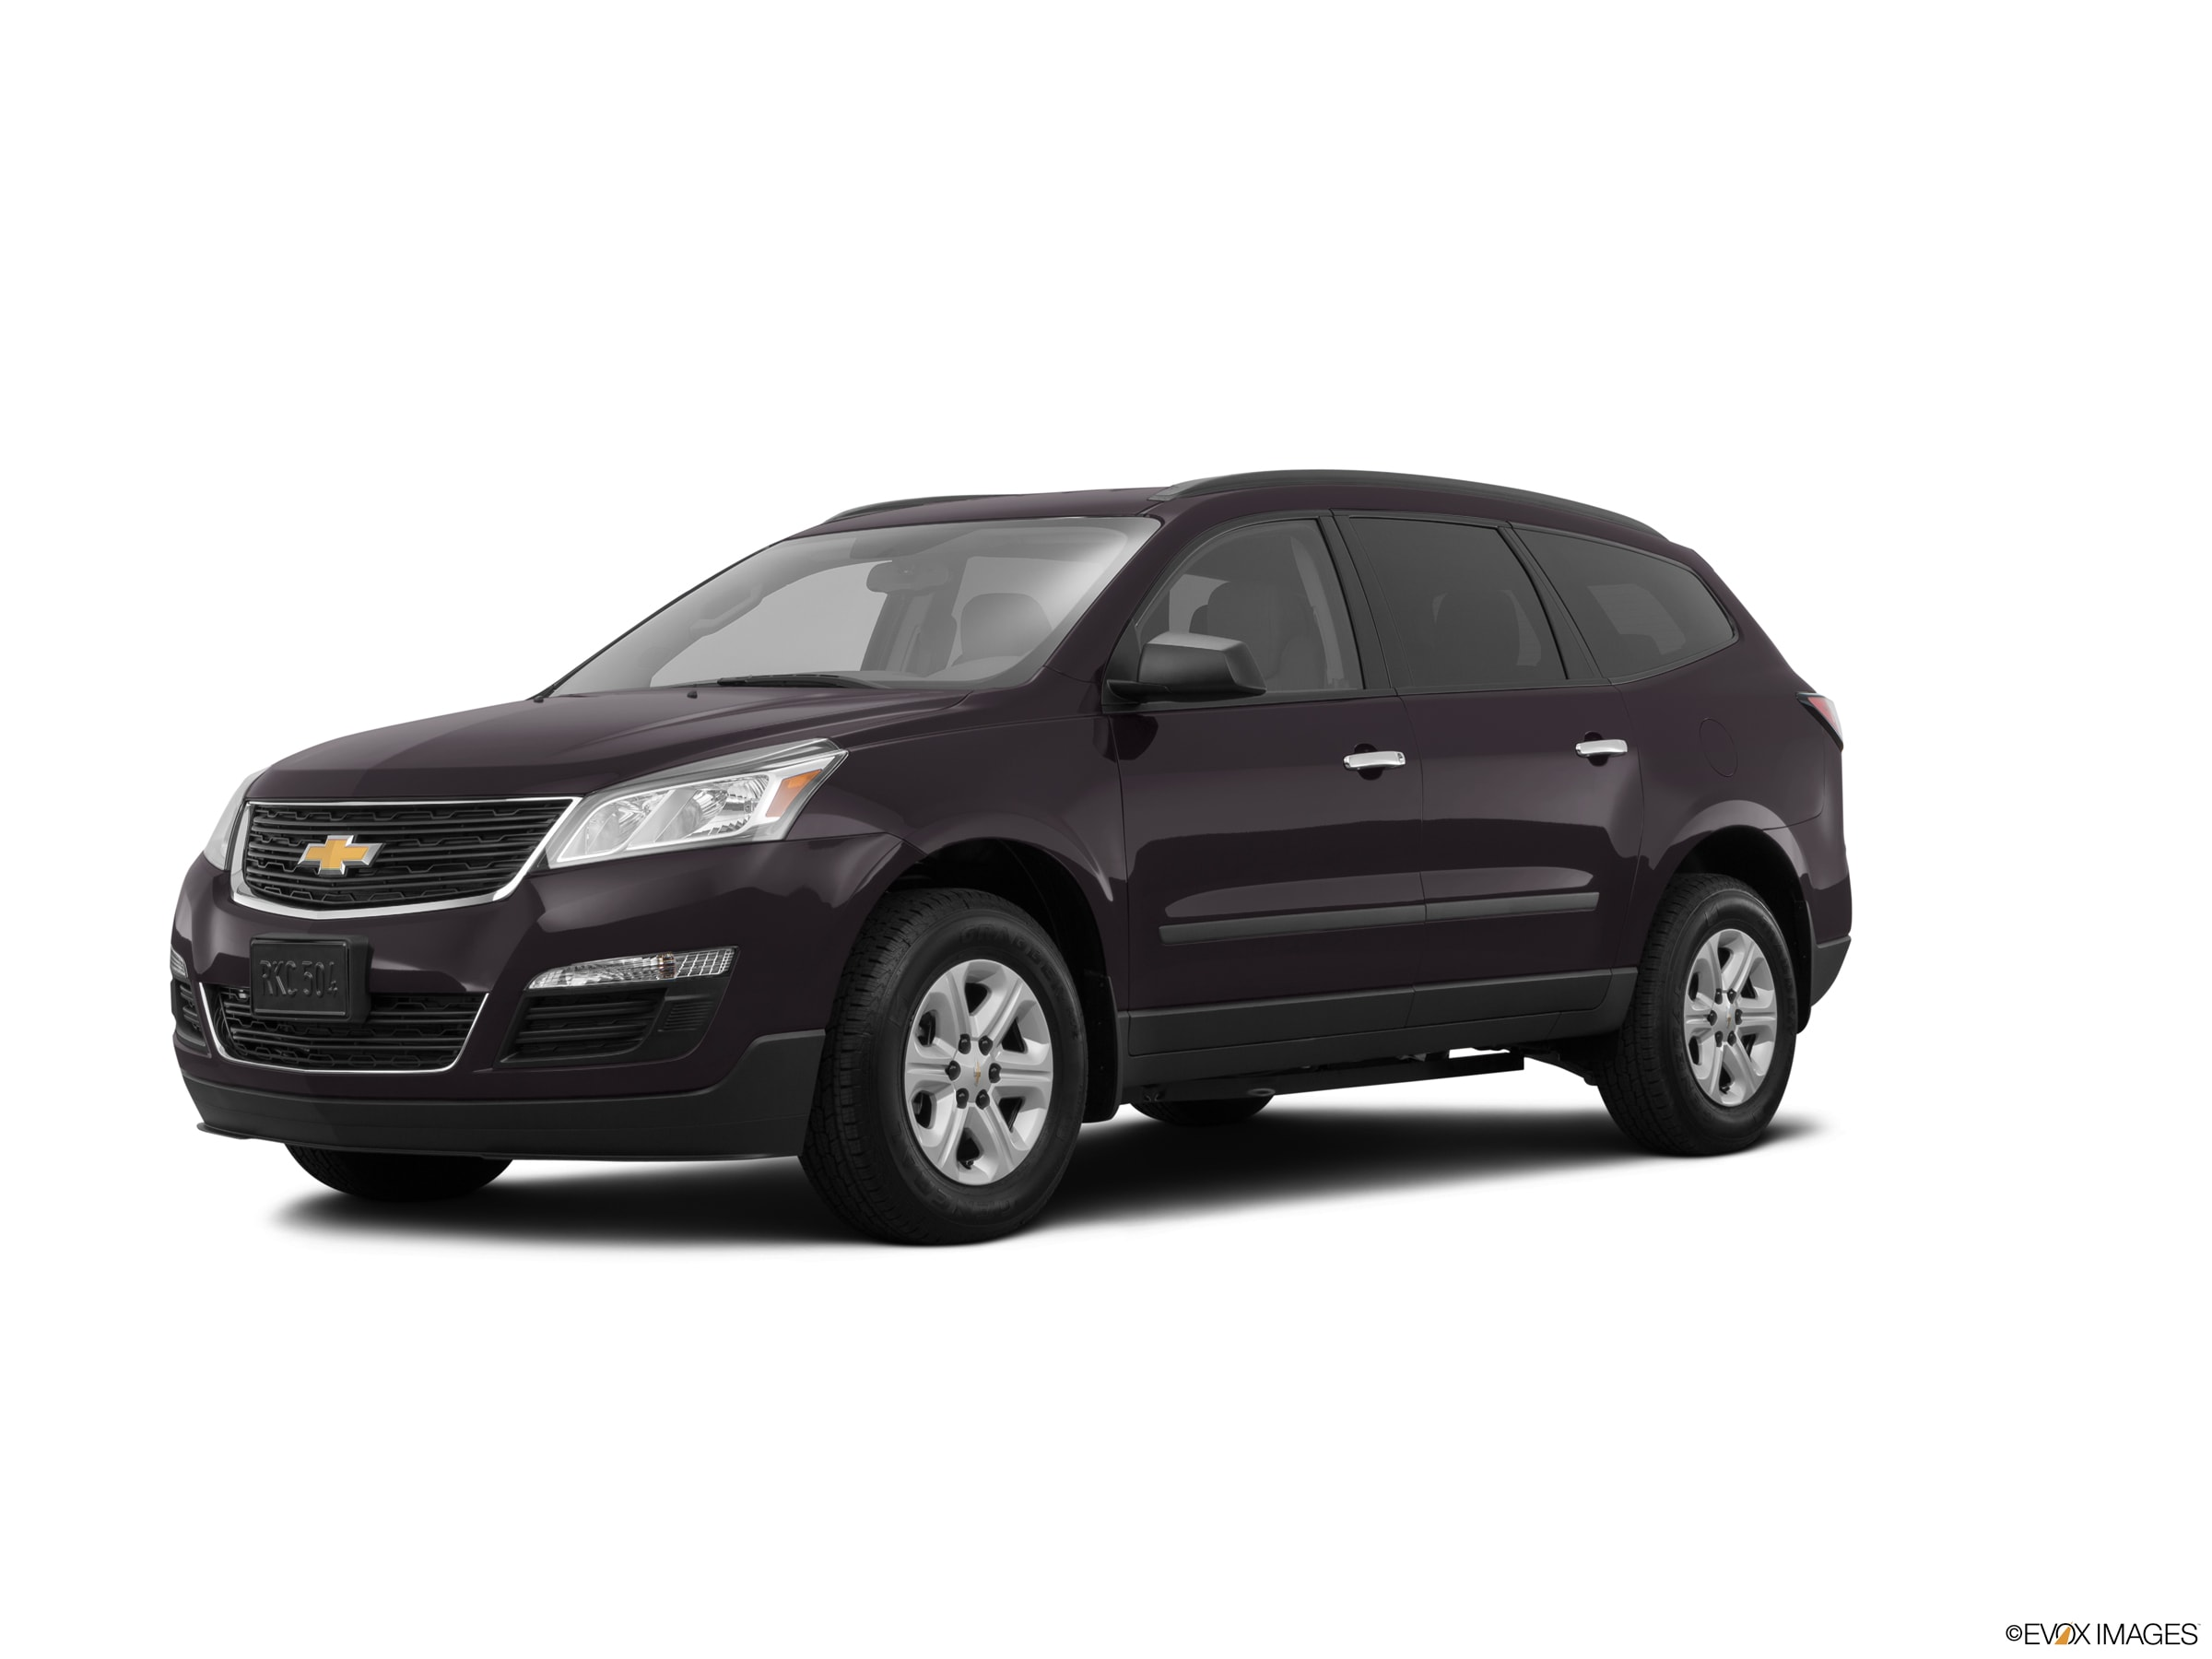 2016 Chevrolet Traverse SUV